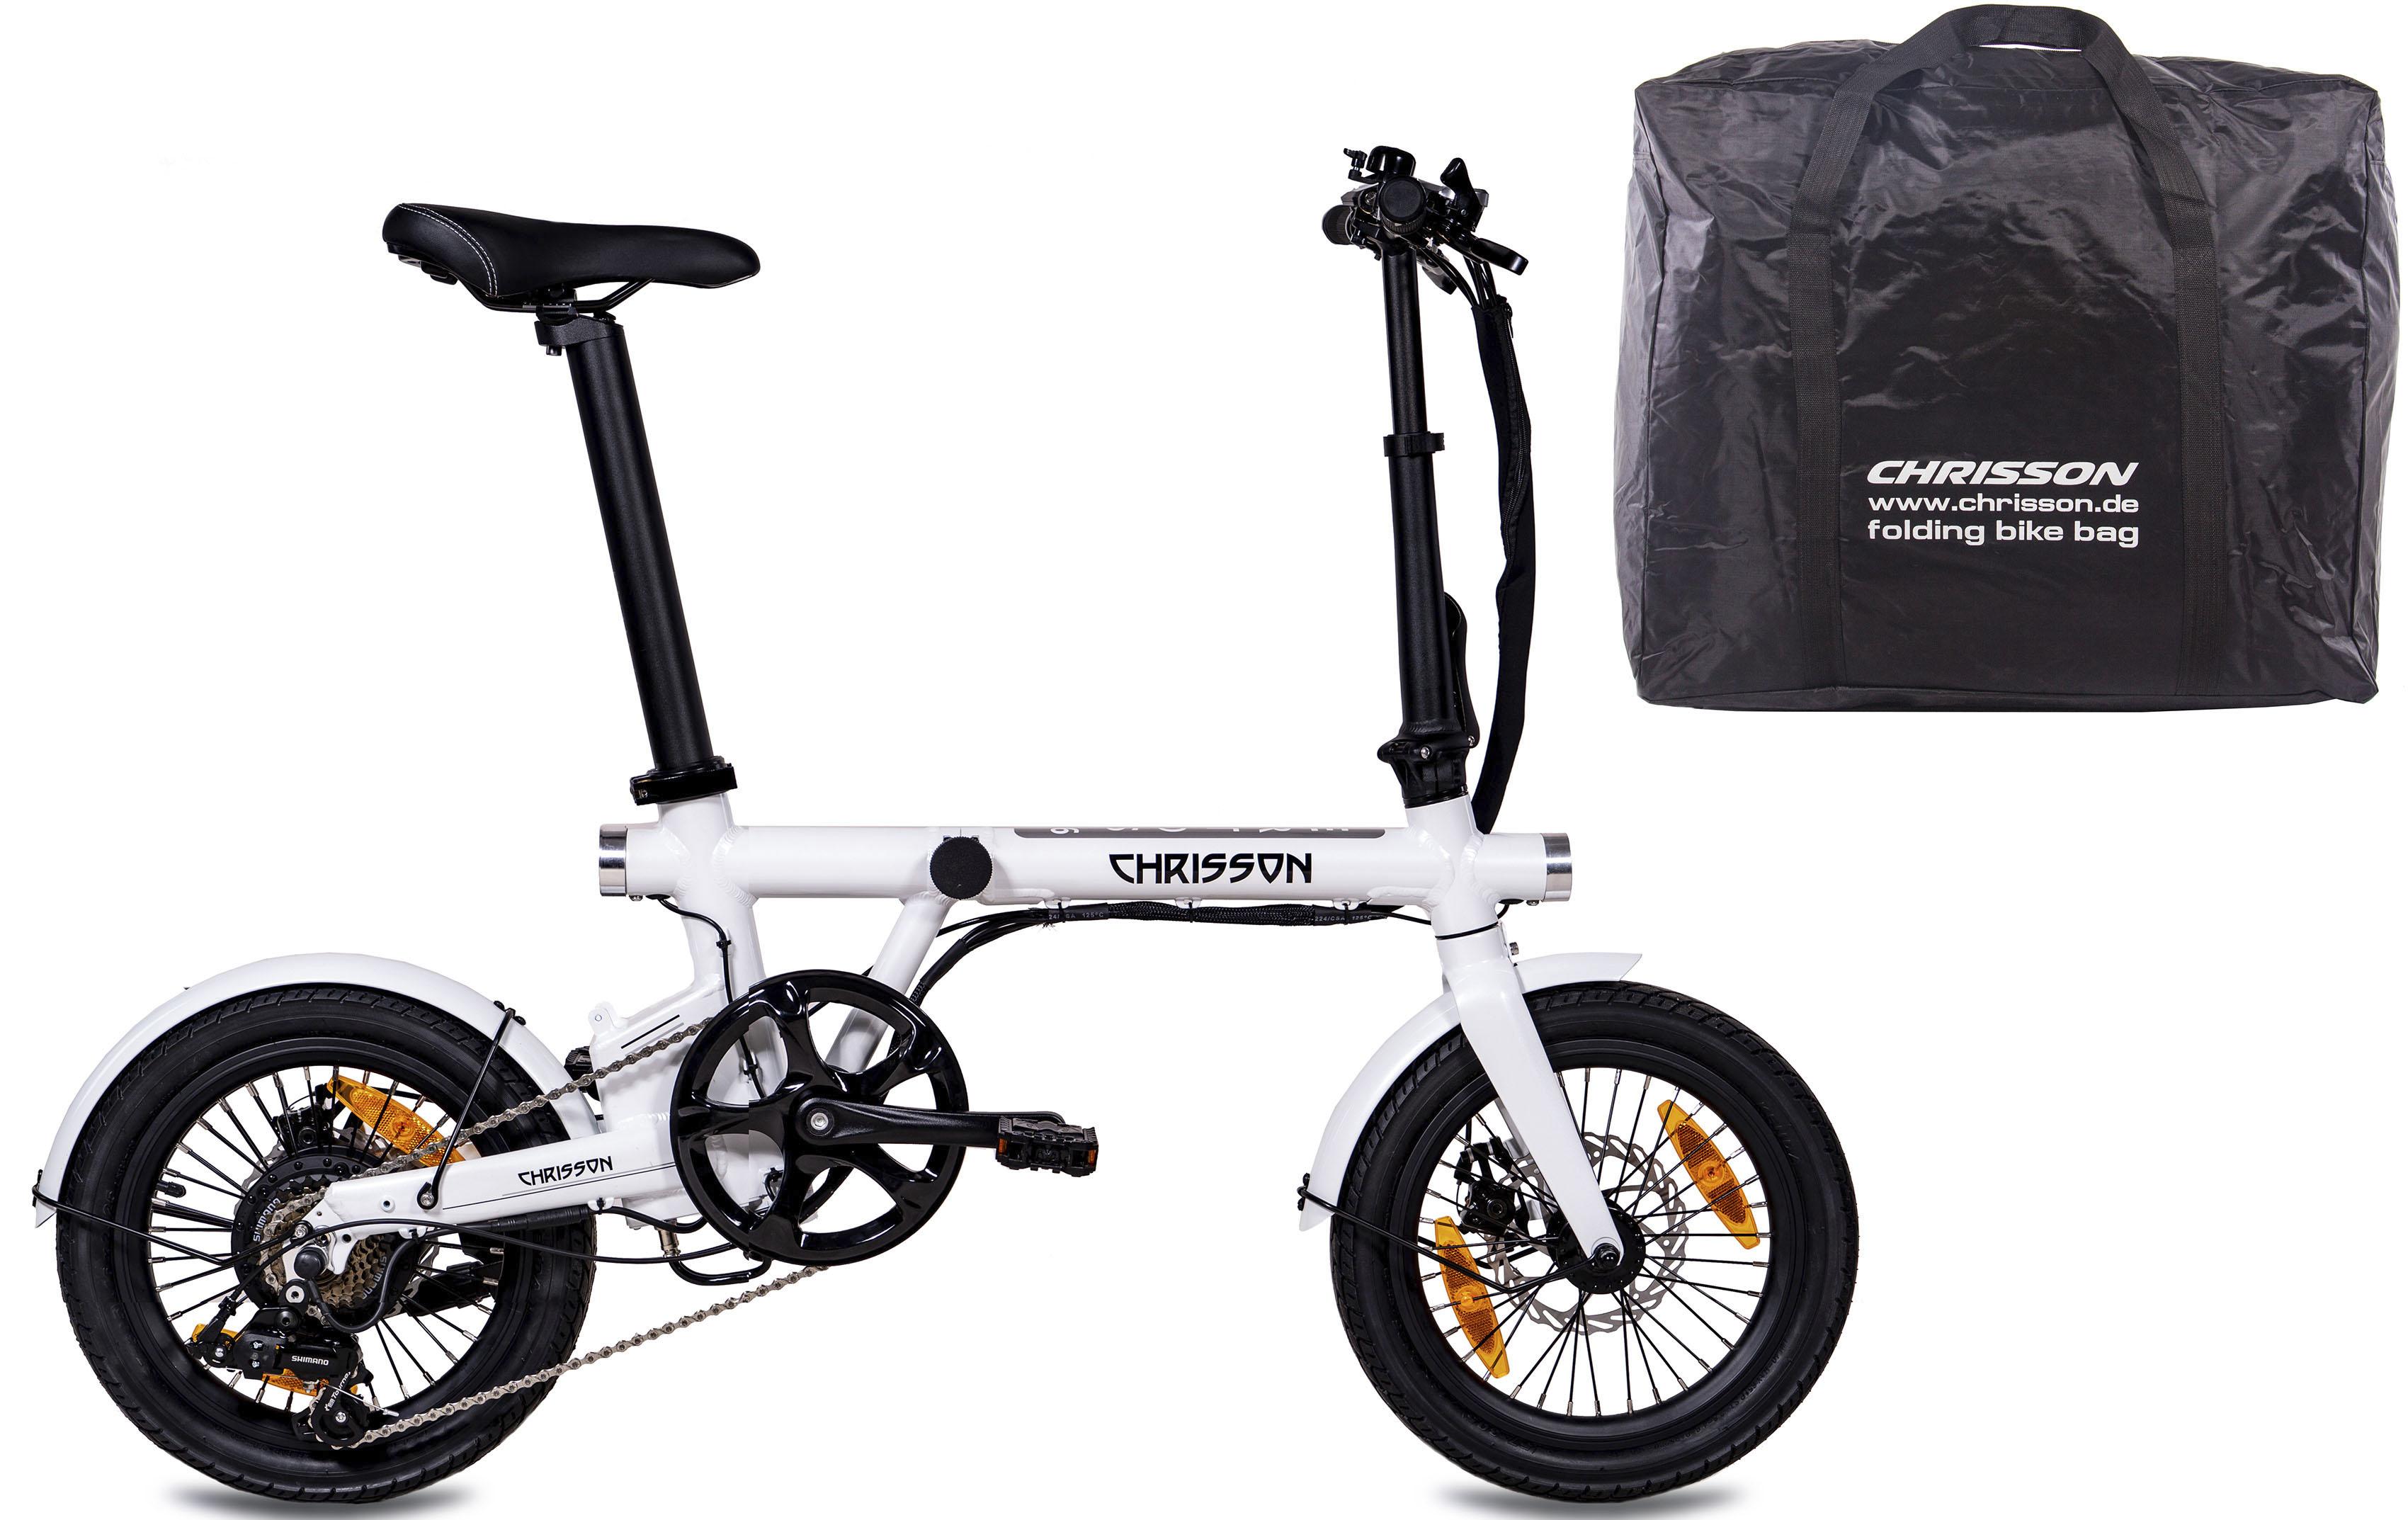 Chrisson E-Bike ERTOS16 v2.0, 7 Gang, Shimano, Tourney RD-FT35, Heckmotor 250 W weiß E-Bikes Fahrräder Zubehör